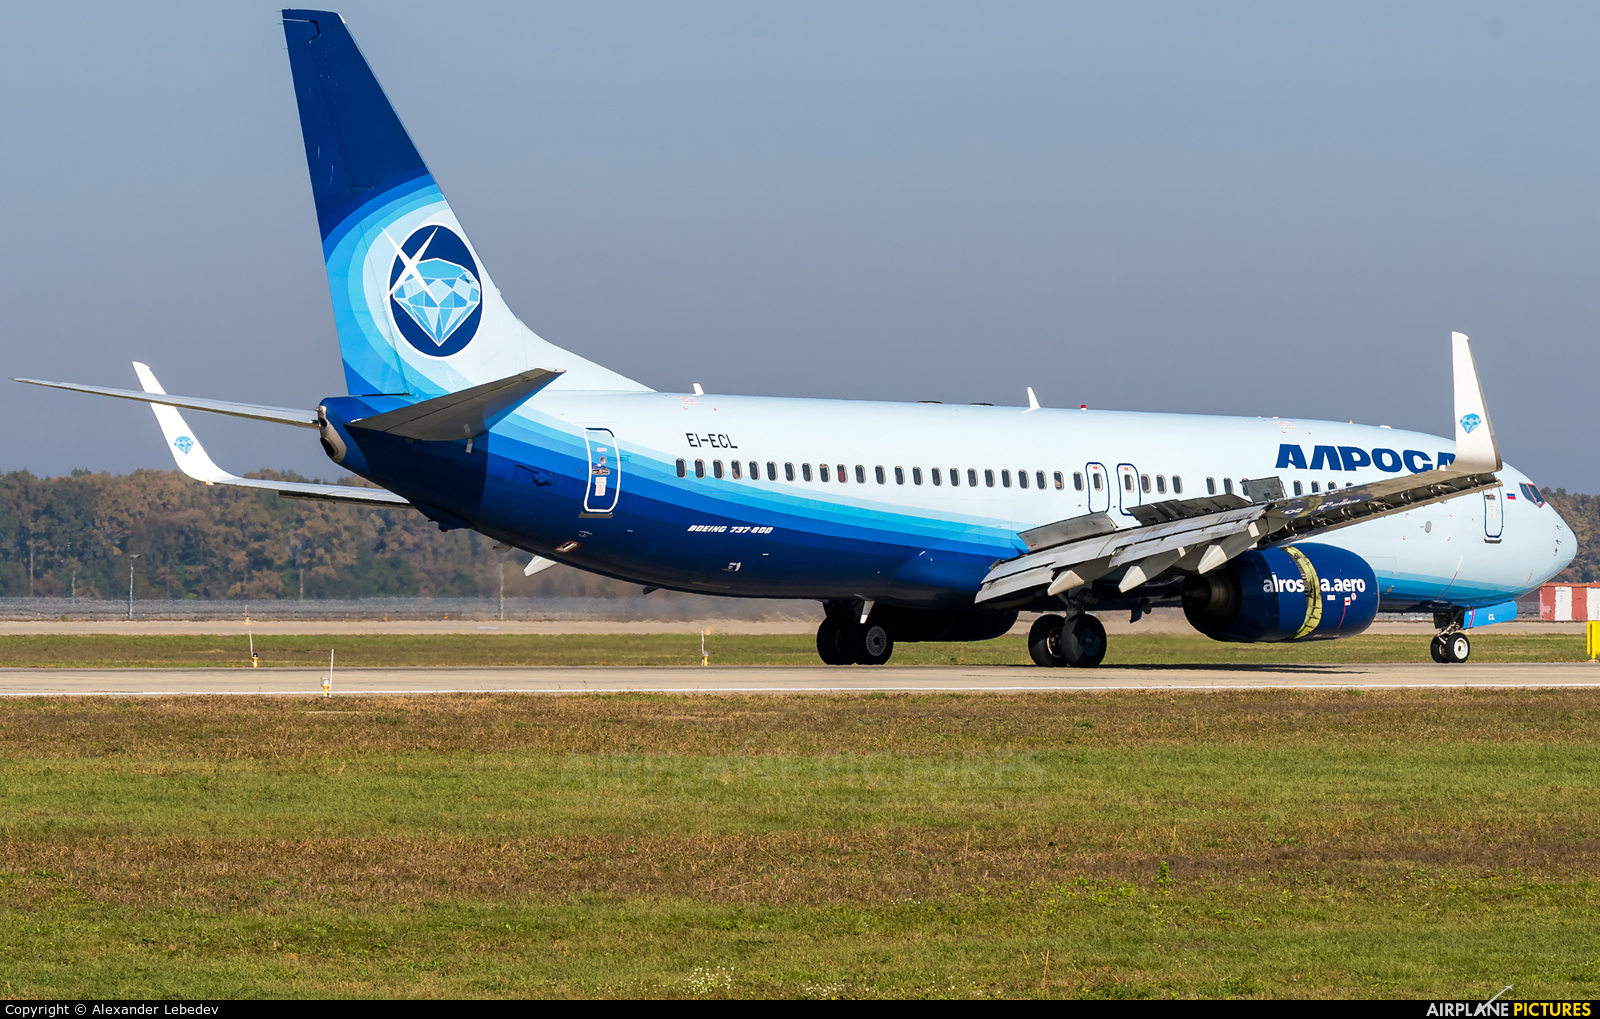 Alrosa EI-ECL aircraft at Krasnodar